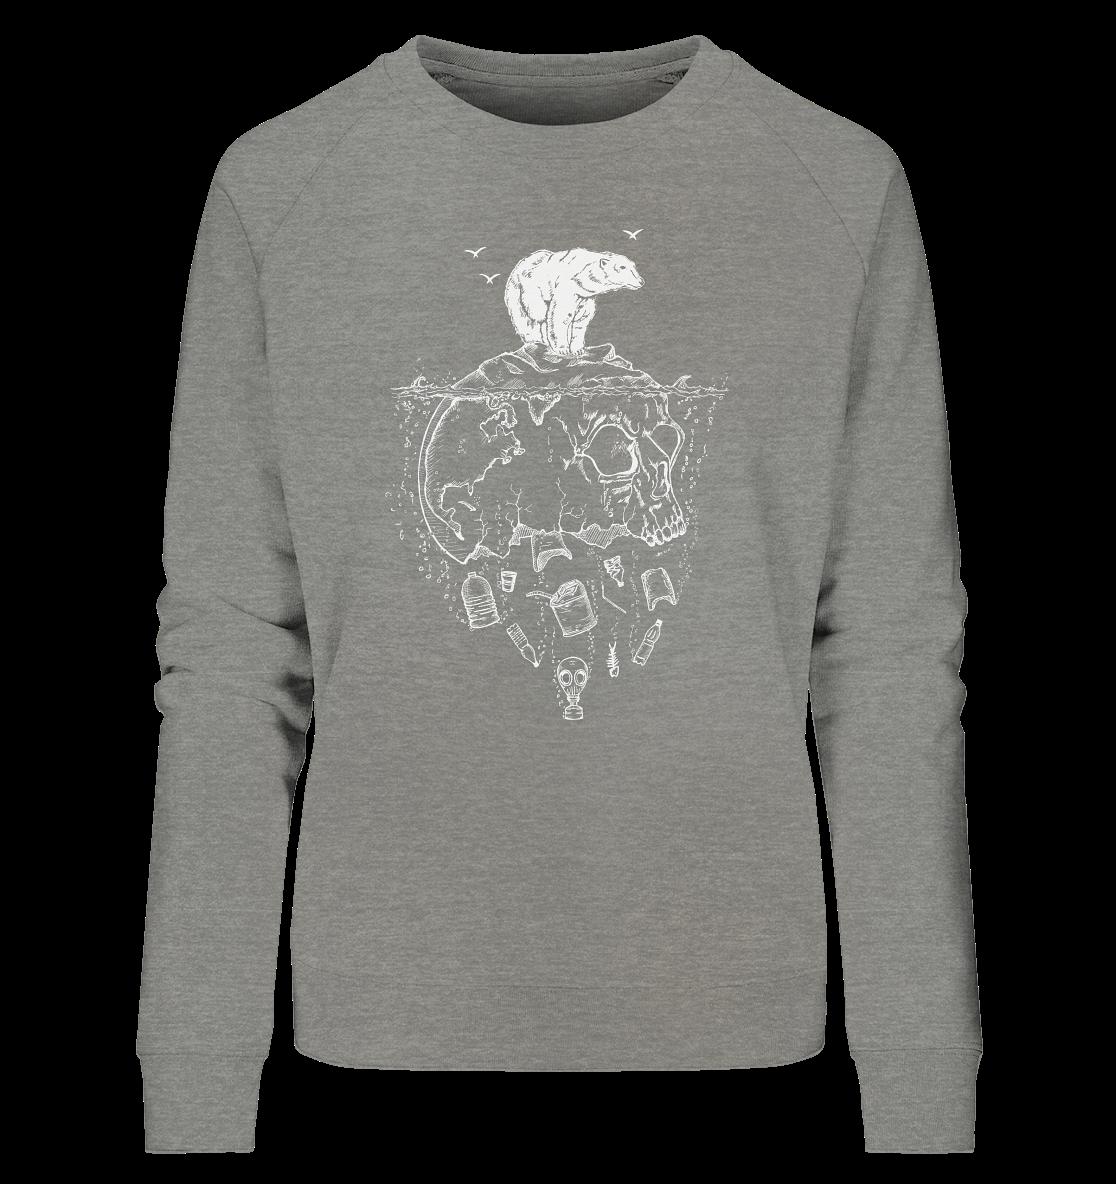 front-ladies-organic-sweatshirt-818381-1116x-11.png